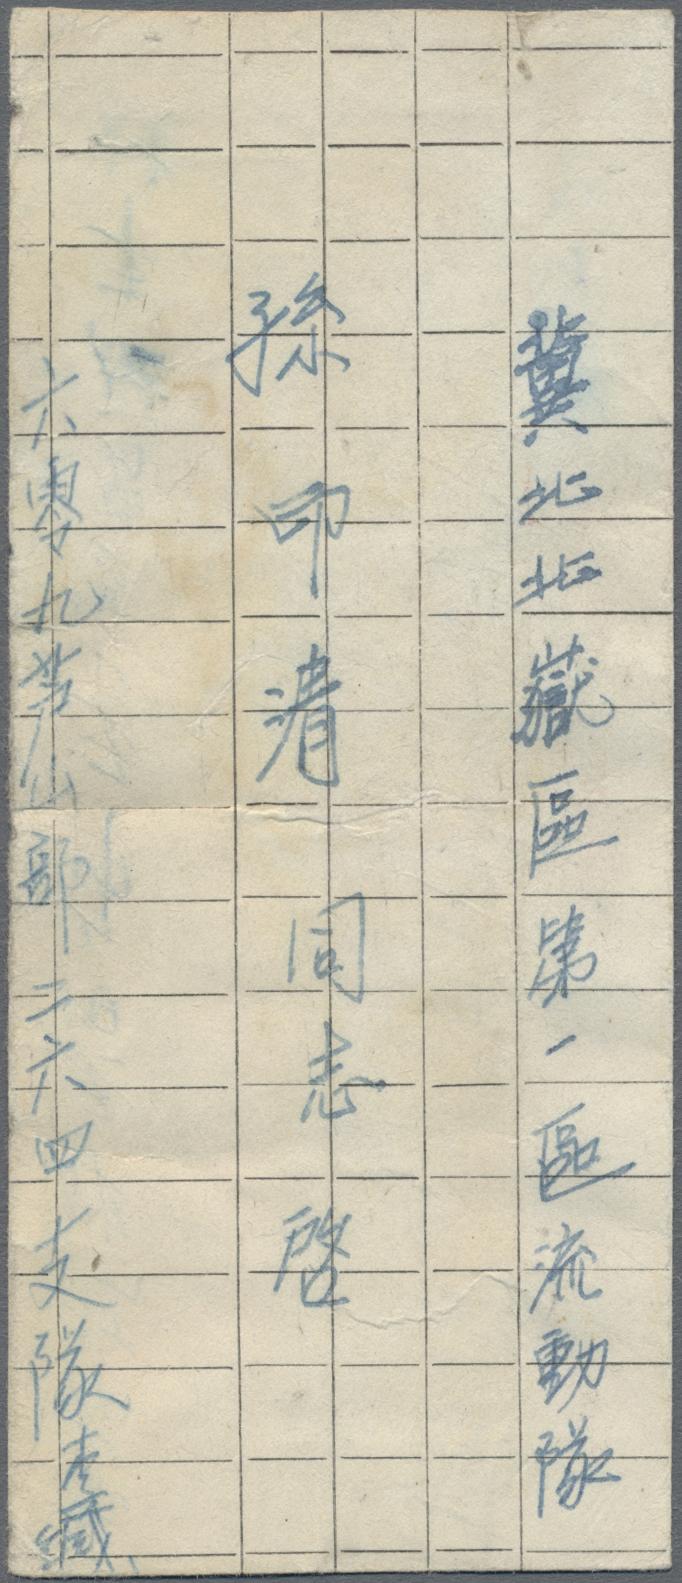 Lot 05524 - China - Volksrepublik - Provinzen  -  Auktionshaus Christoph Gärtner GmbH & Co. KG Sale #45- Special Auction China